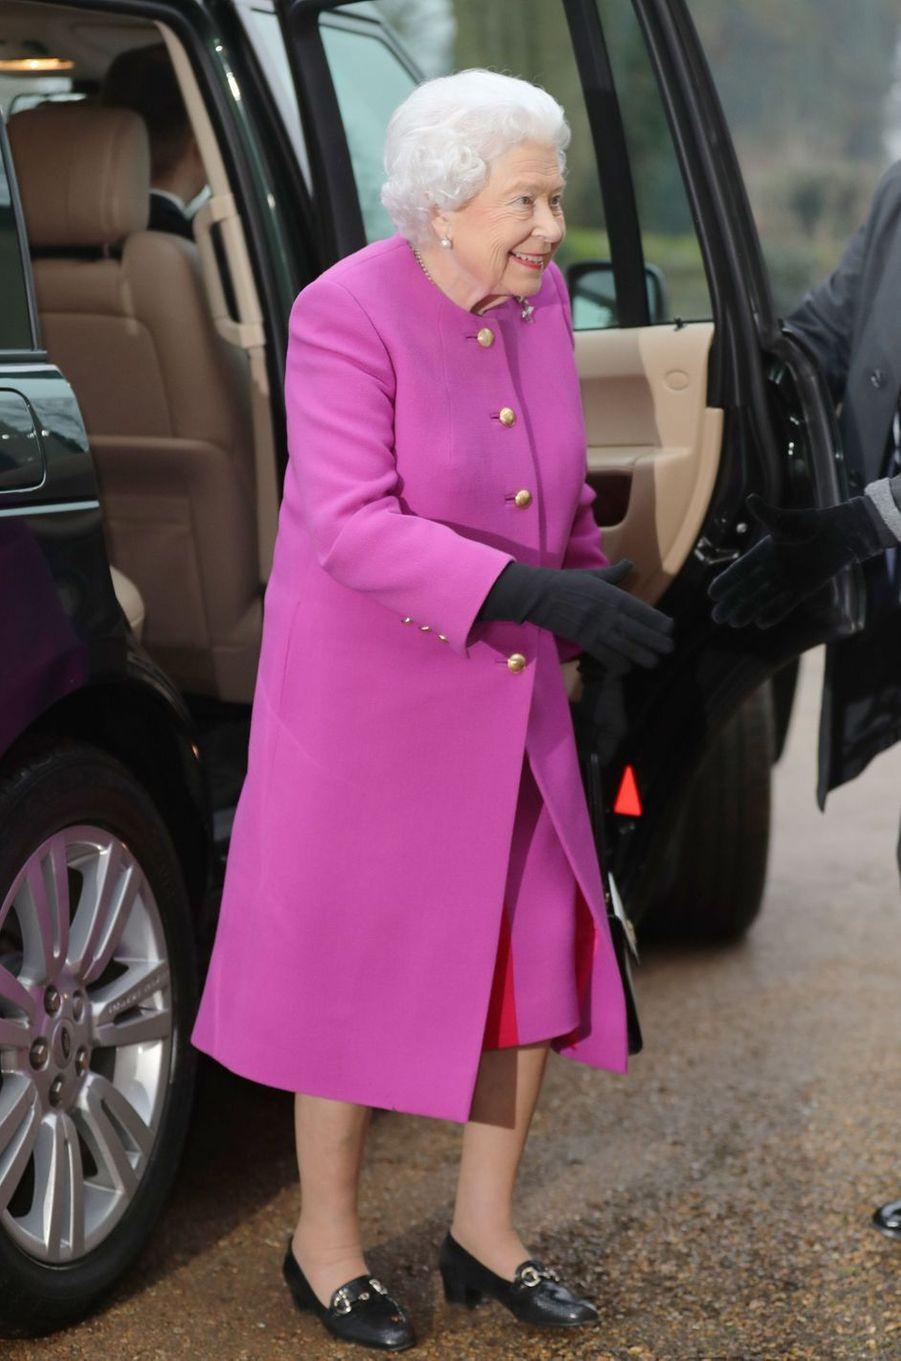 La reine Elizabeth II en rose fuchsia à West Newton, le 19 janvier 2017